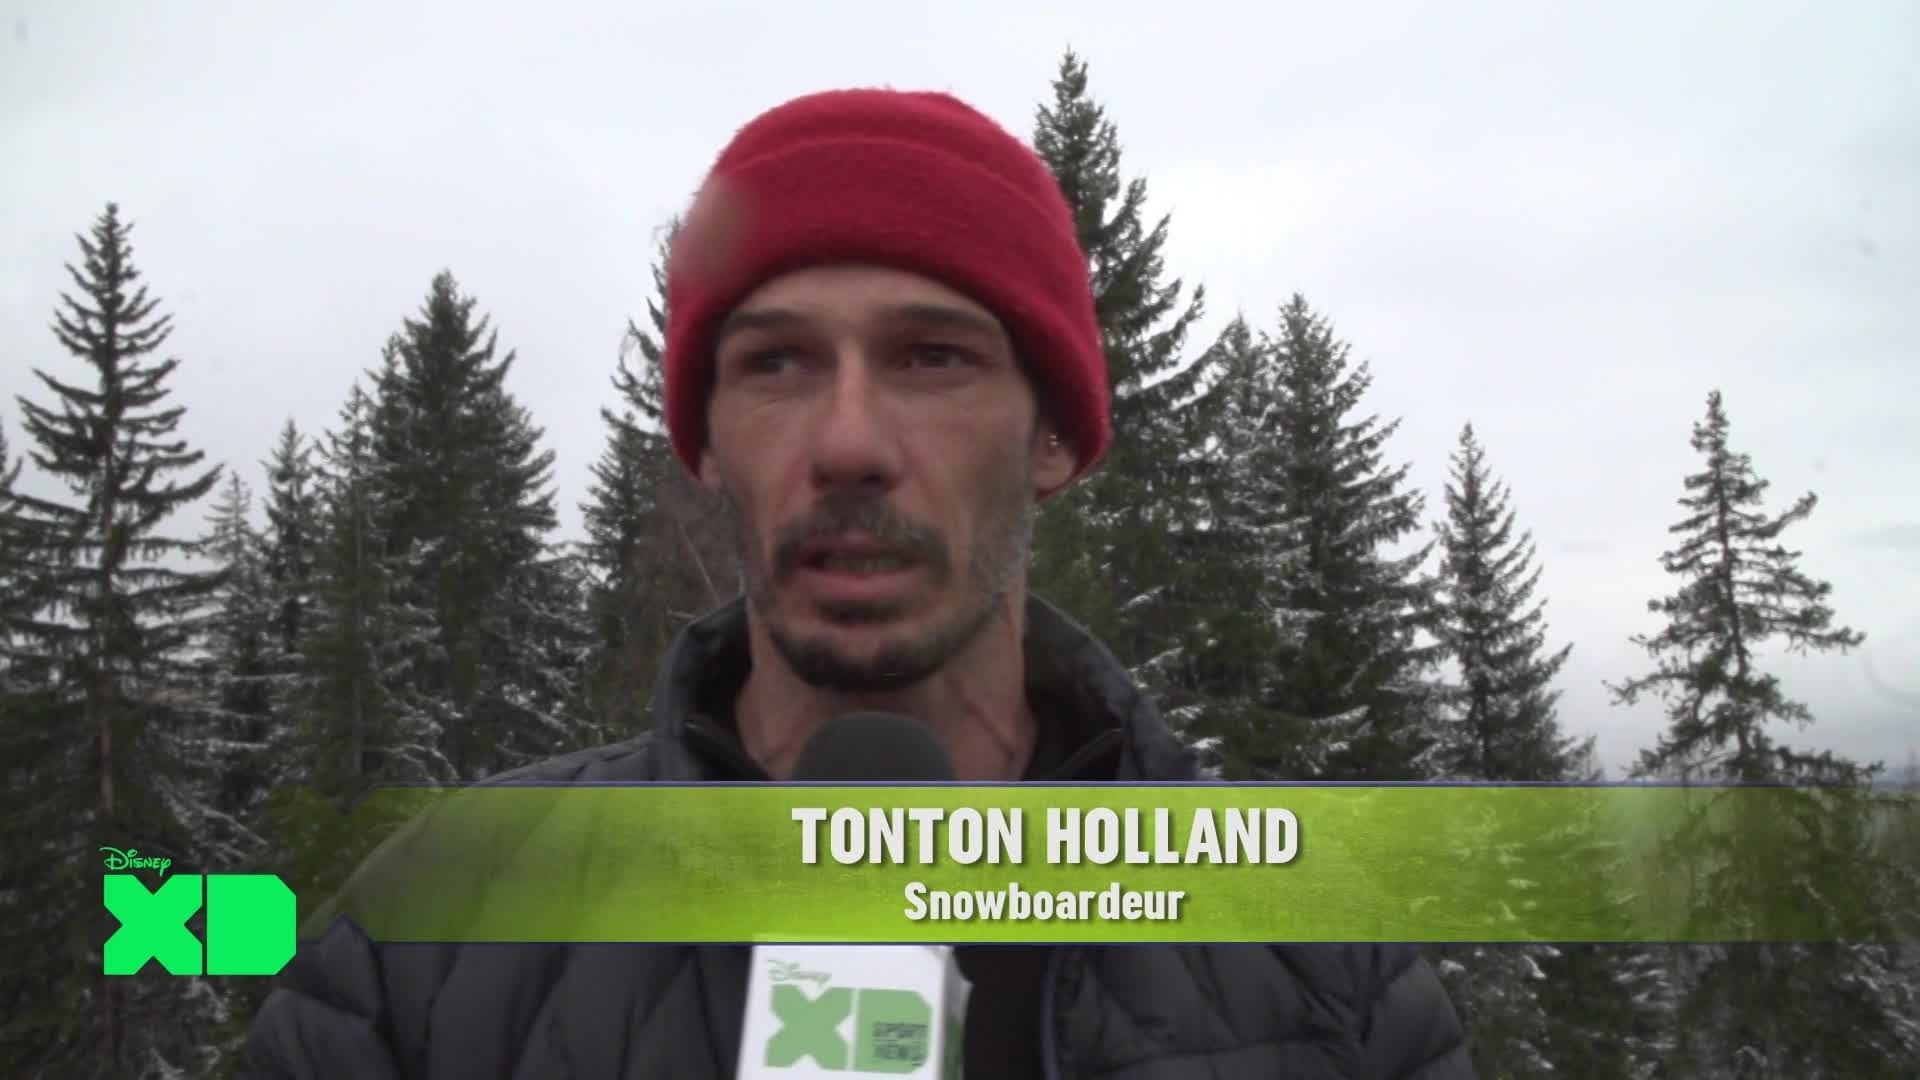 Disney XD Sport News - Snowboard : Tonton Holland